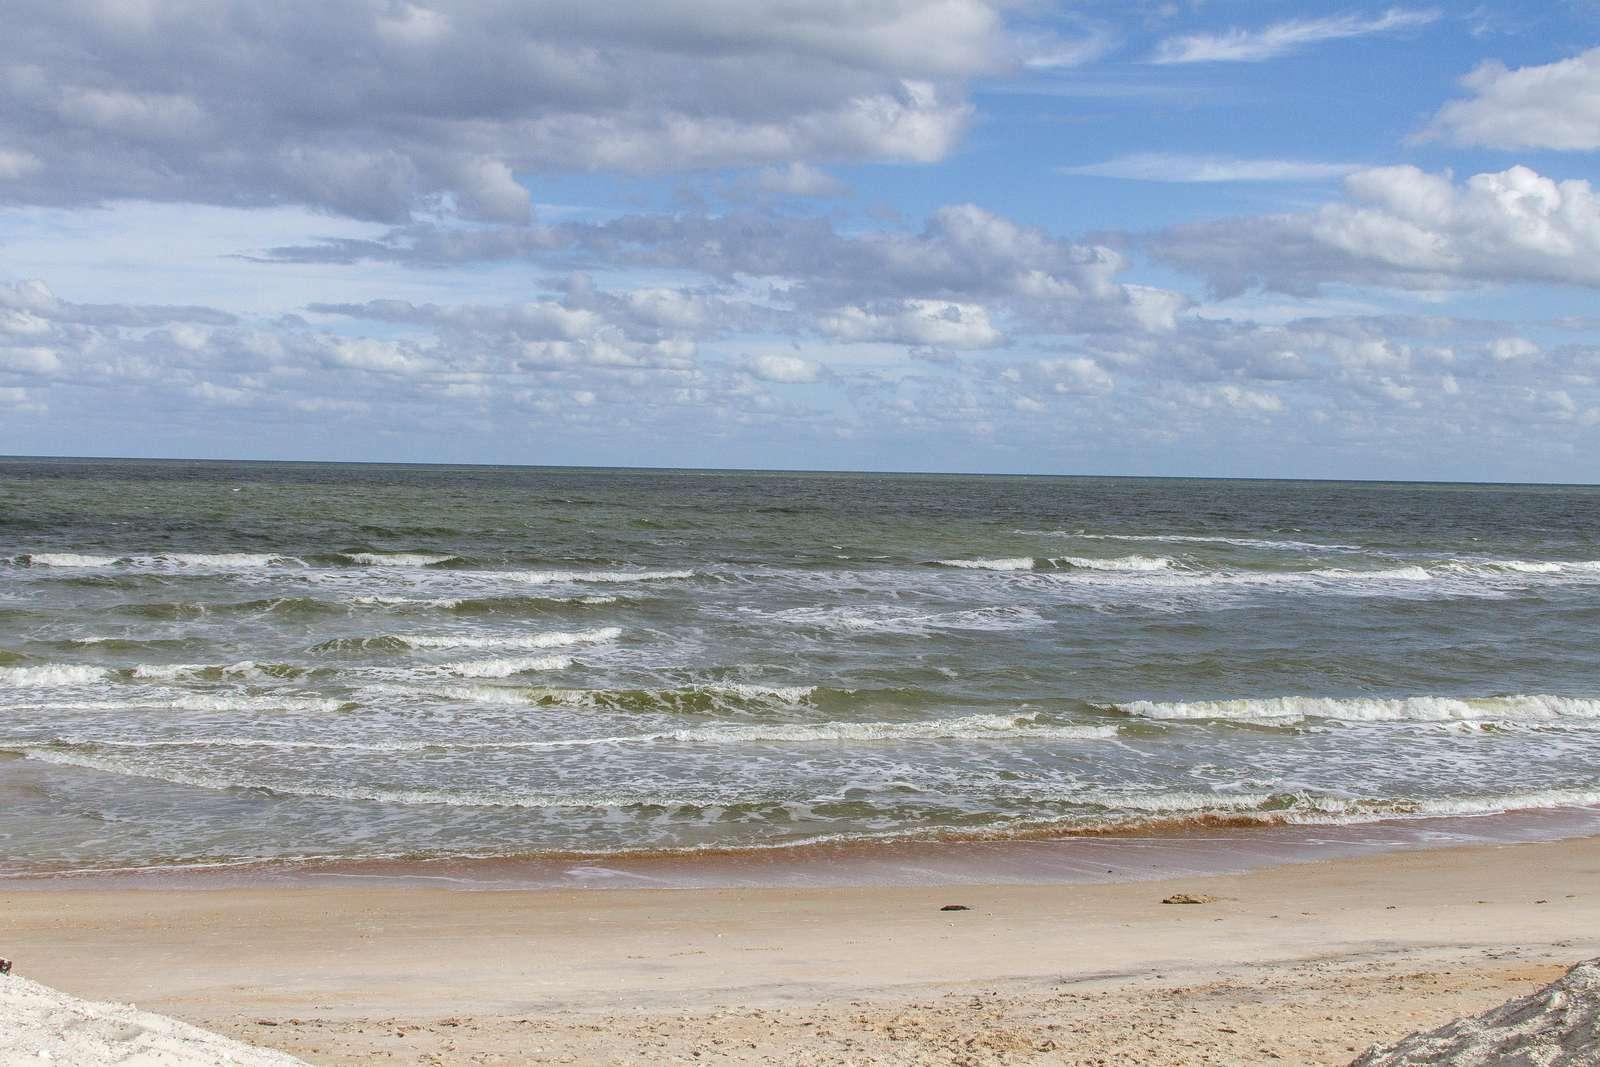 Atlantic Ocean at St. Augustine Beach